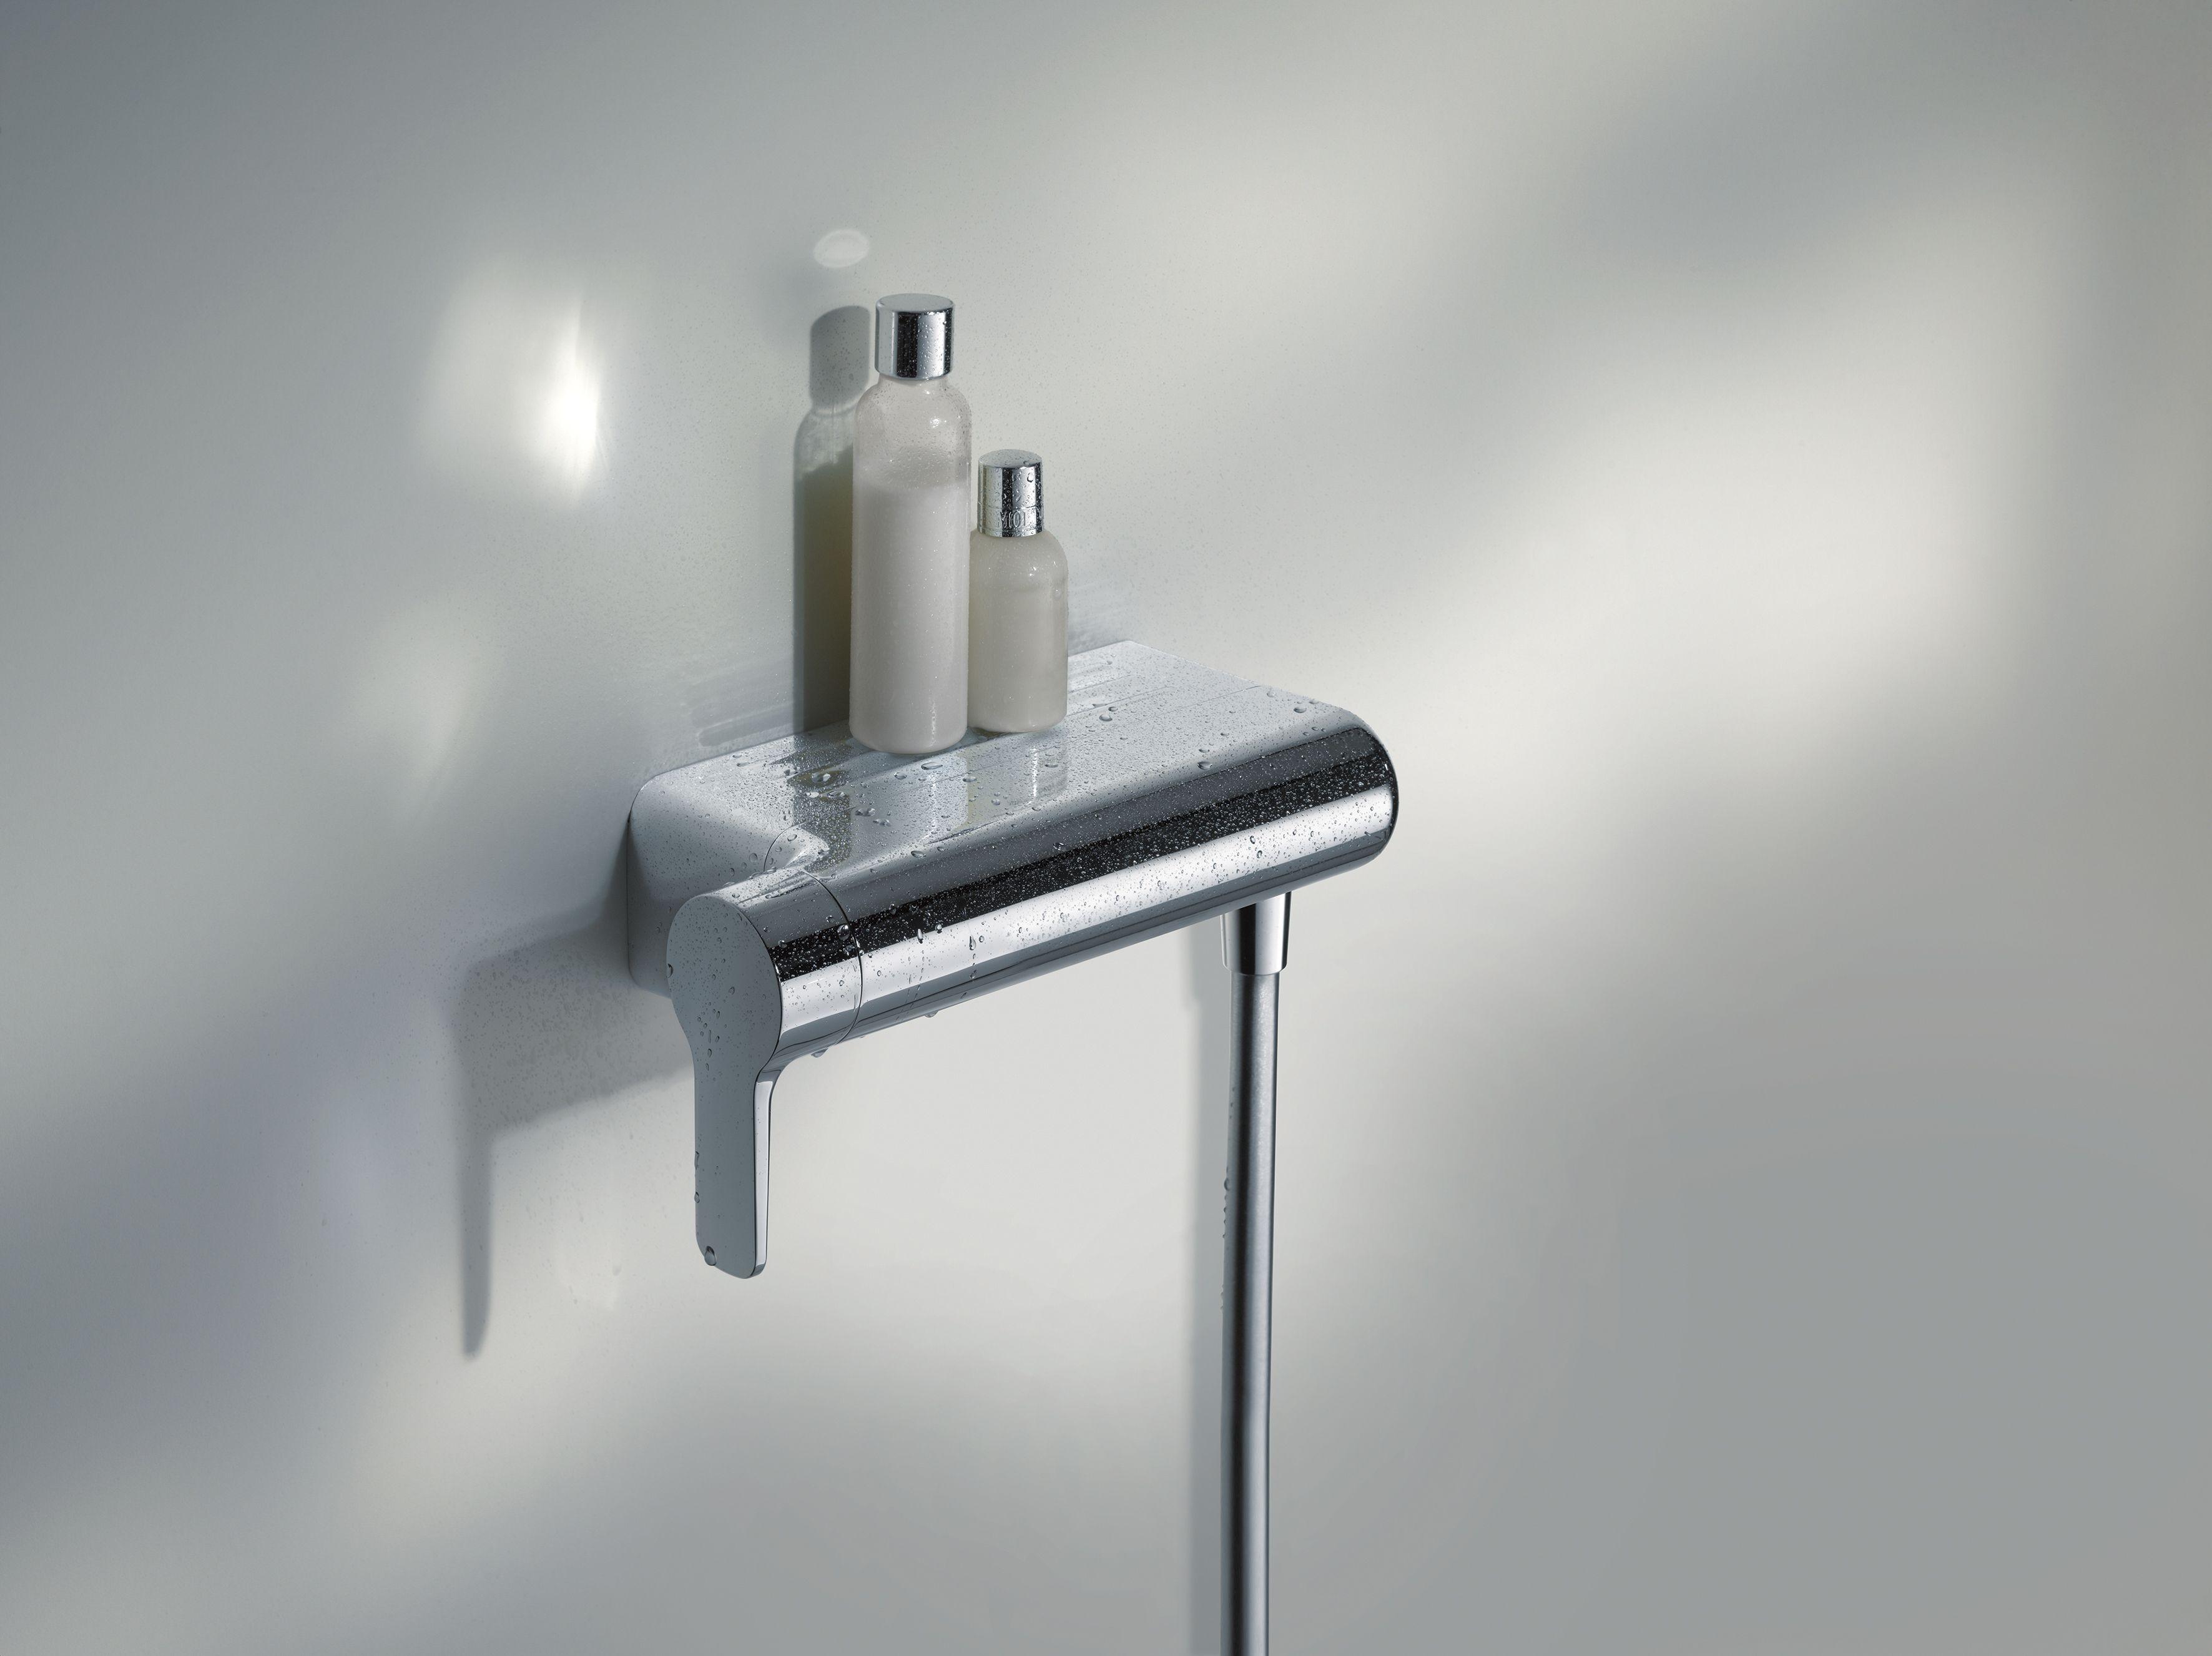 Keuco Collection Moll Bathroomfurniture Architecture Design Sanitar Badezimmerteppich Gaste Wc